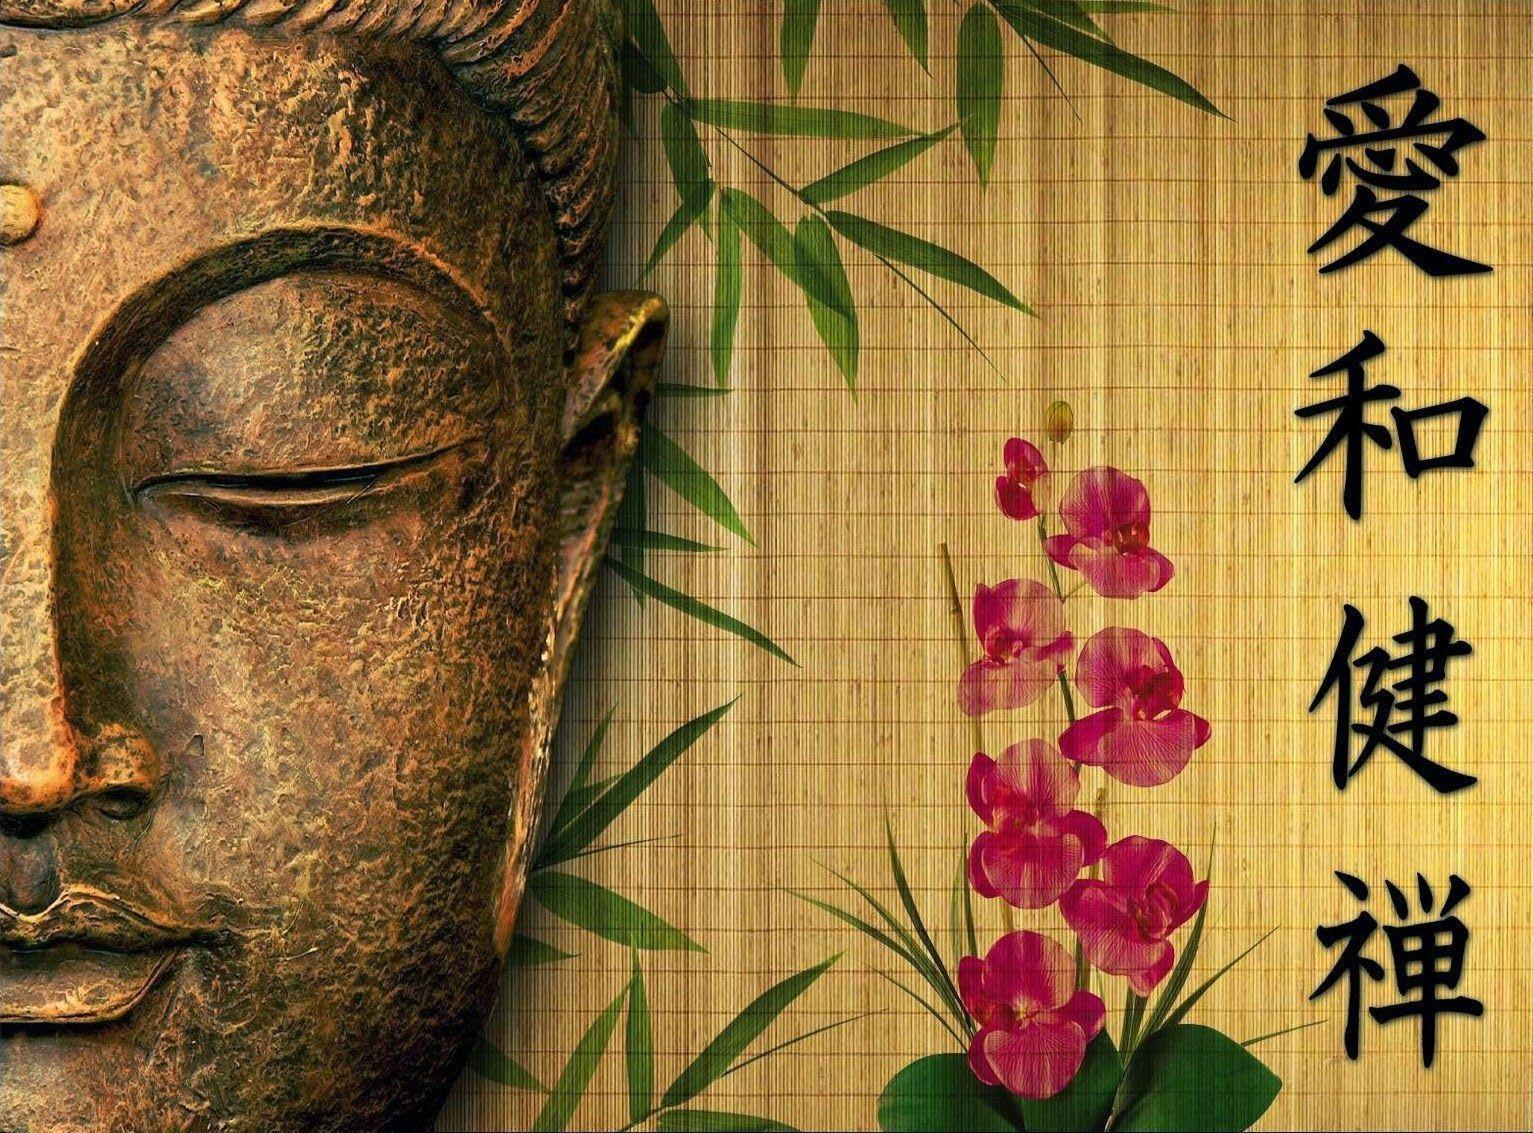 Buddha Art Wallpapers Top Free Buddha Art Backgrounds Wallpaperaccess